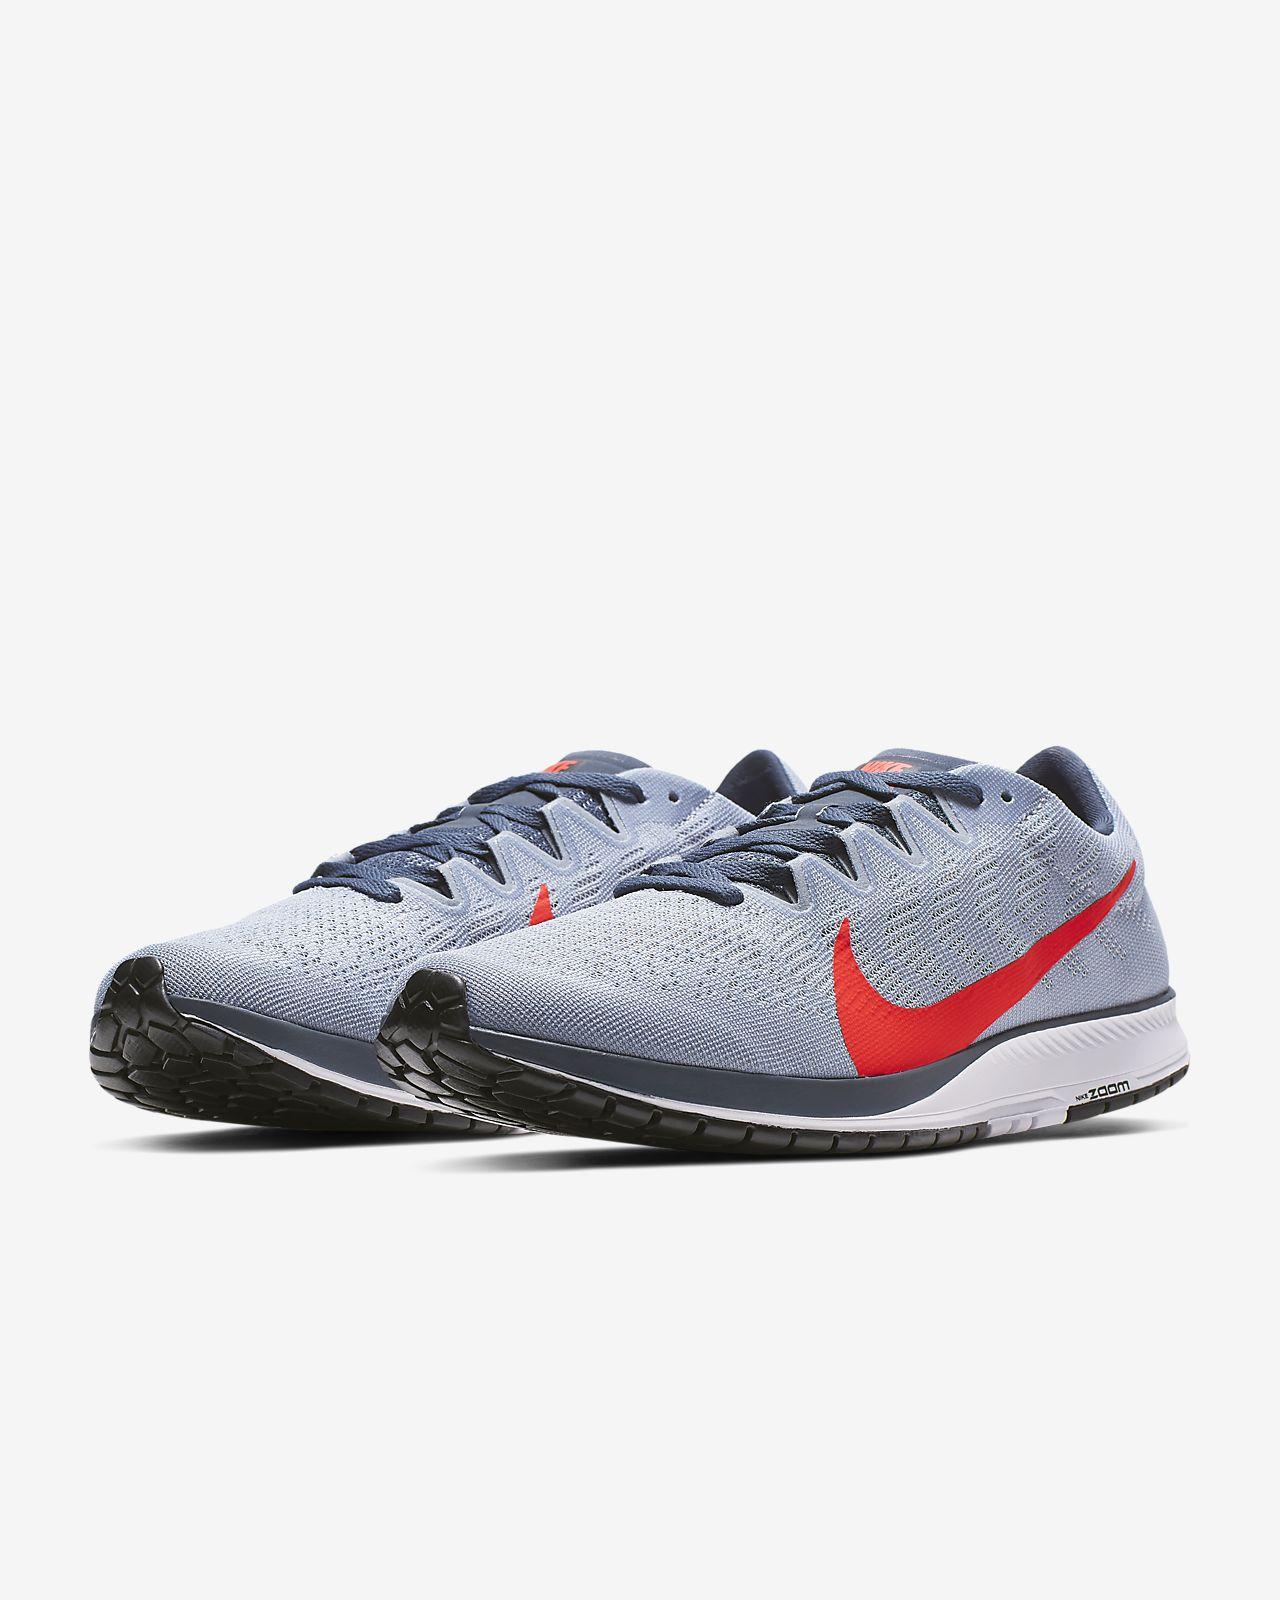 online retailer e181b 780d2 ... Nike Air Zoom Streak 7 Running Shoe